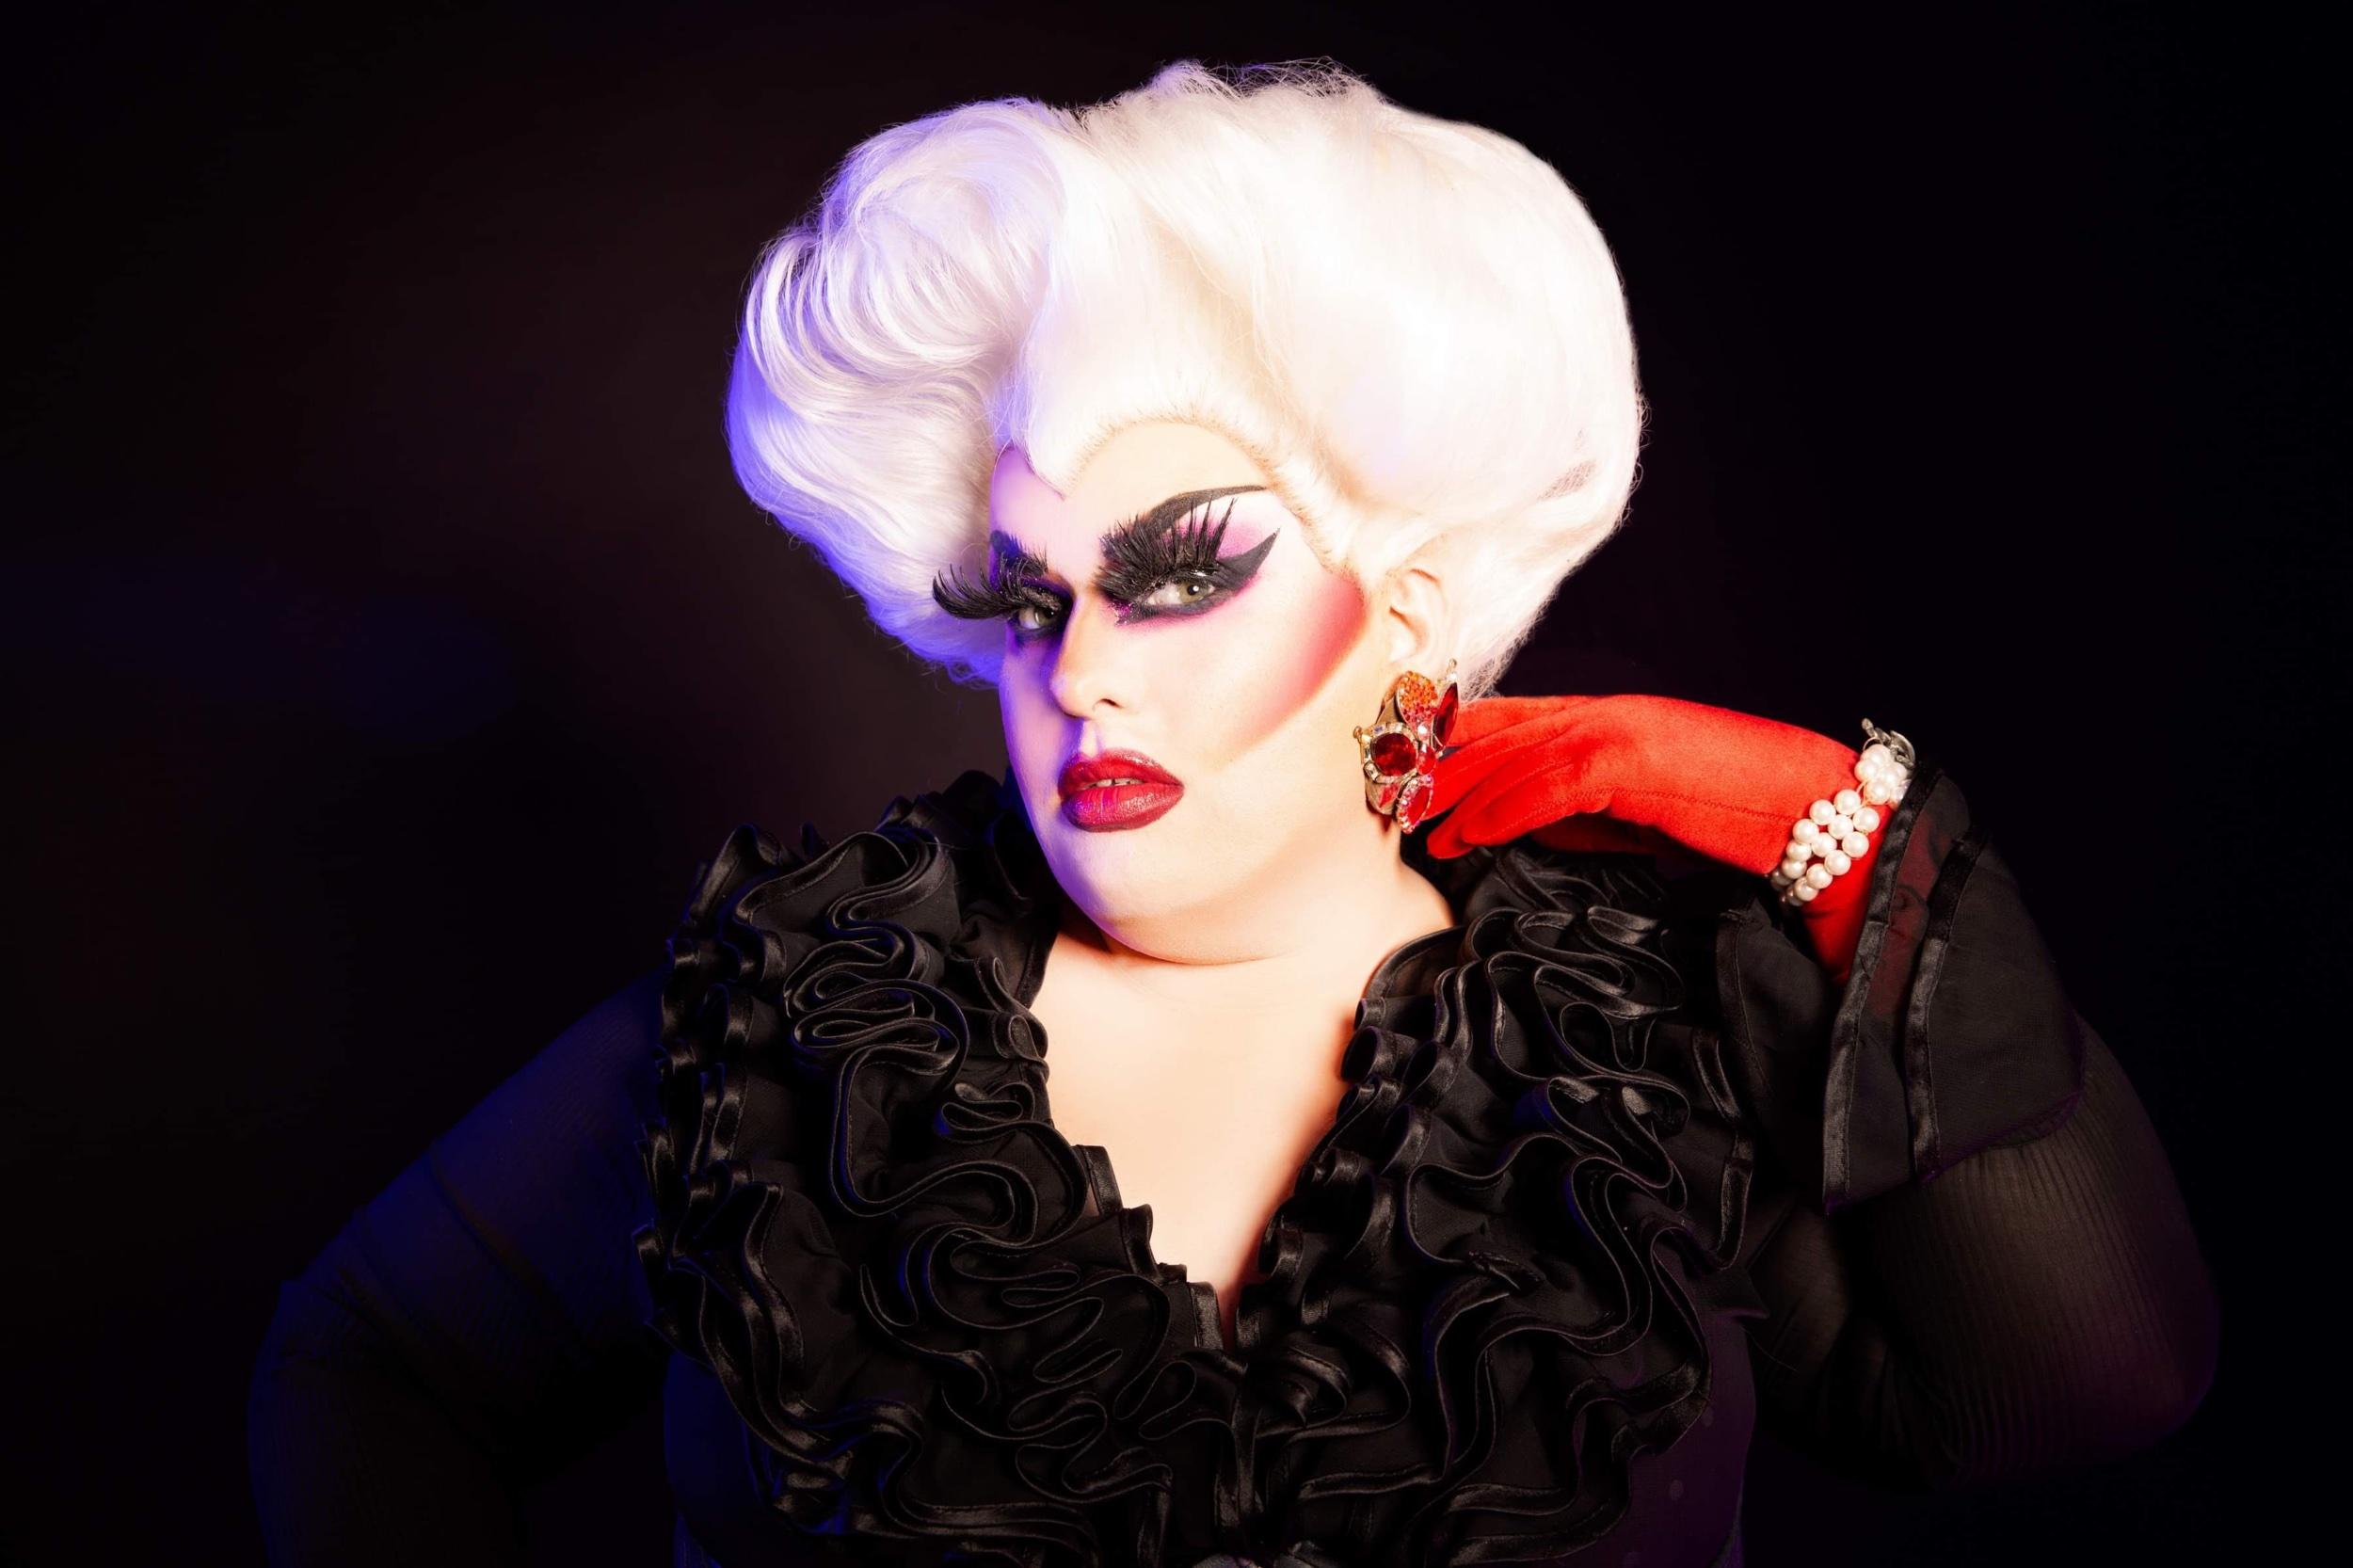 Model, Hair & Makeup:  Vivian Darling . Dress & Accessories: Vivian Darling.  Karlie Cary Lanni , Principal Photographer